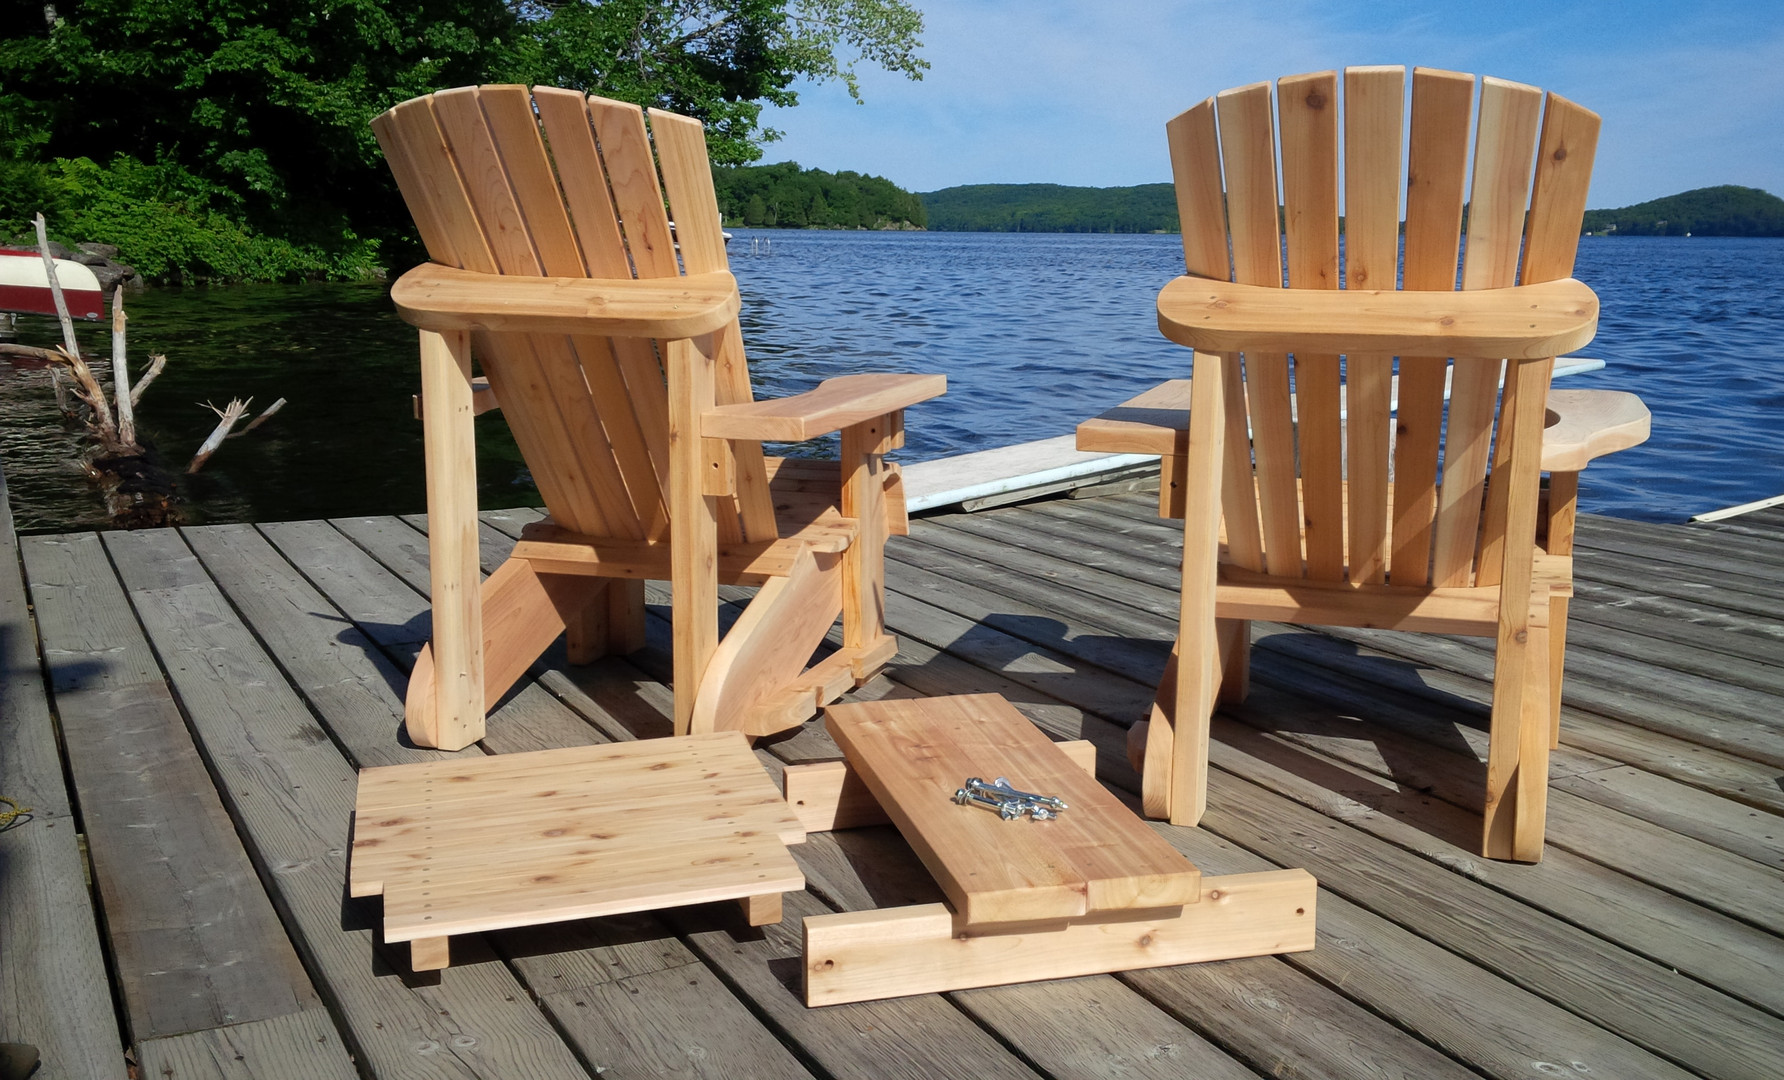 Muskoka Chairs with Table